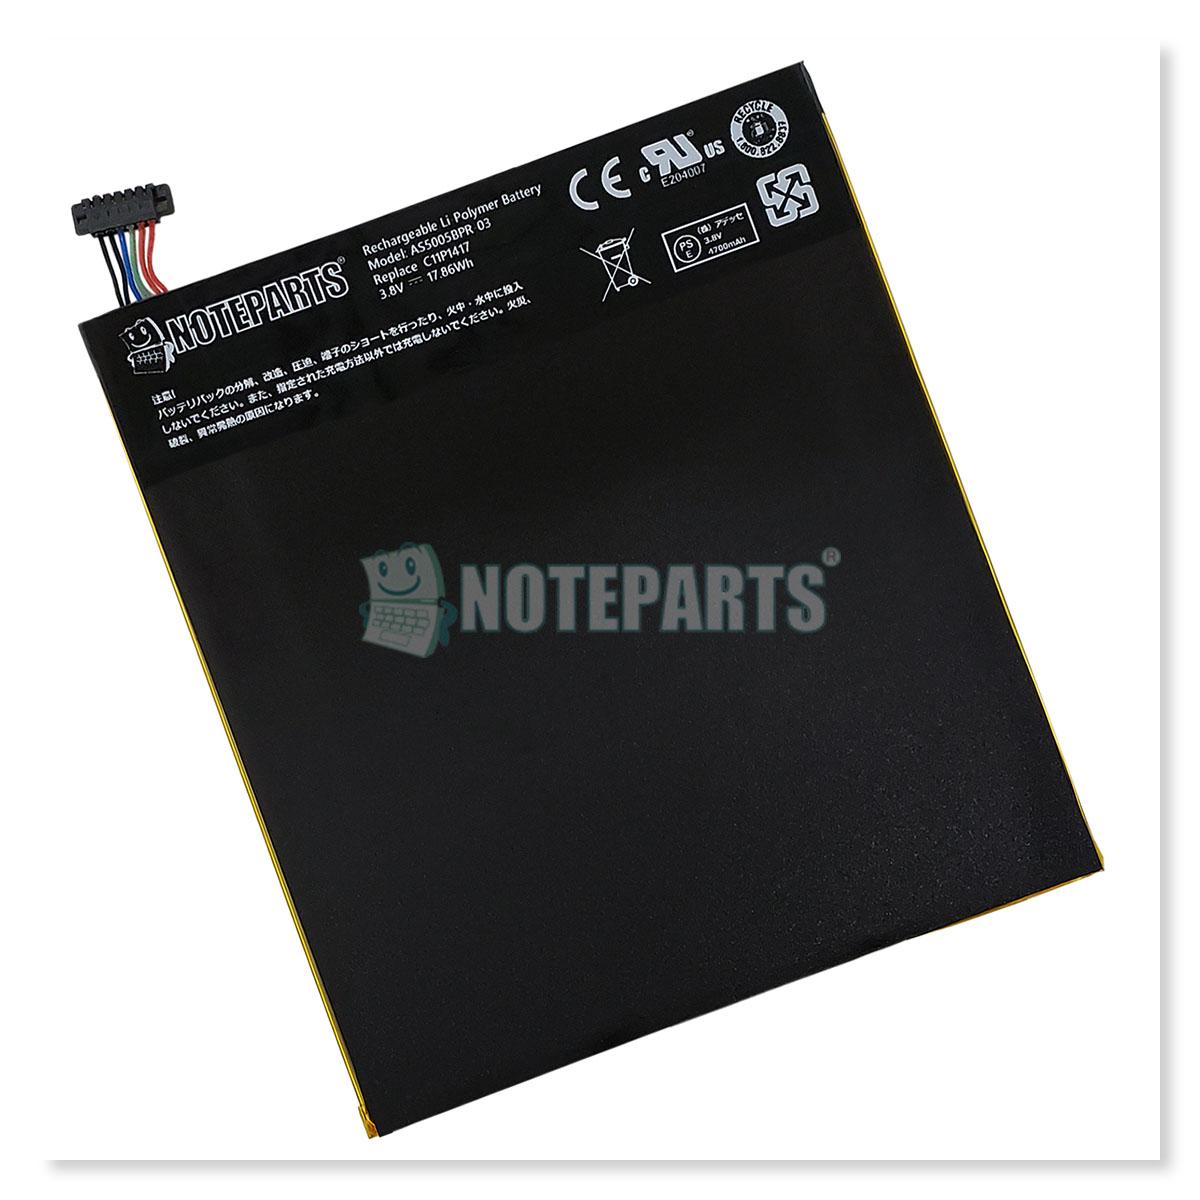 Asus エイスース TransBook T90 Chi バッテリー C11P1417対応